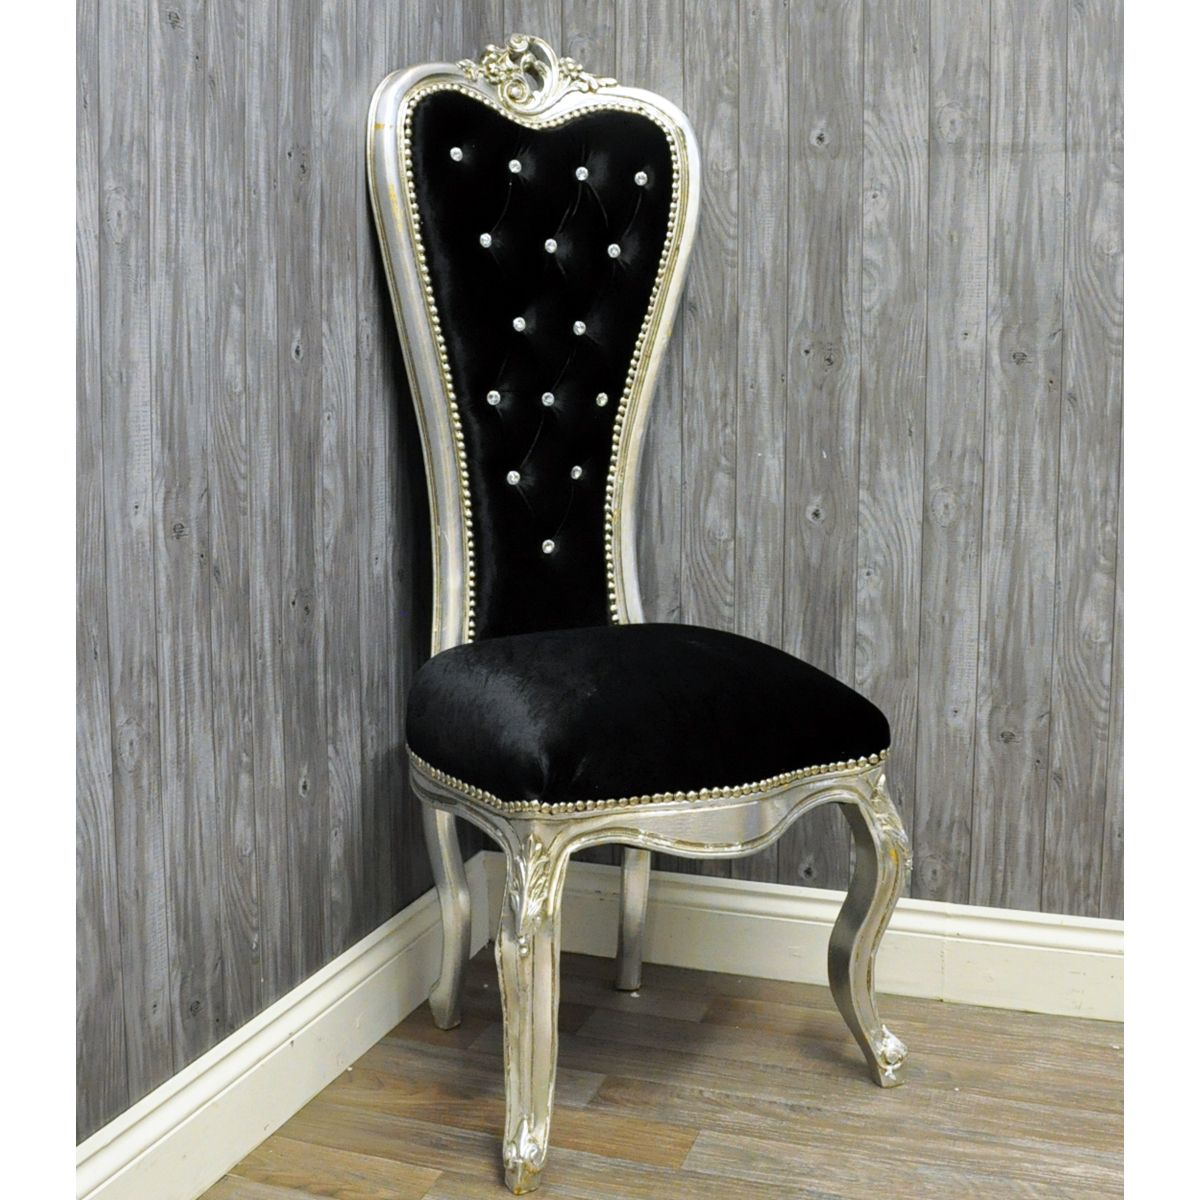 Vintage Style Silver & Black Velvet Wedding Throne Chair - Vintage Style Silver & Black Velvet Wedding Throne Chair Chairs